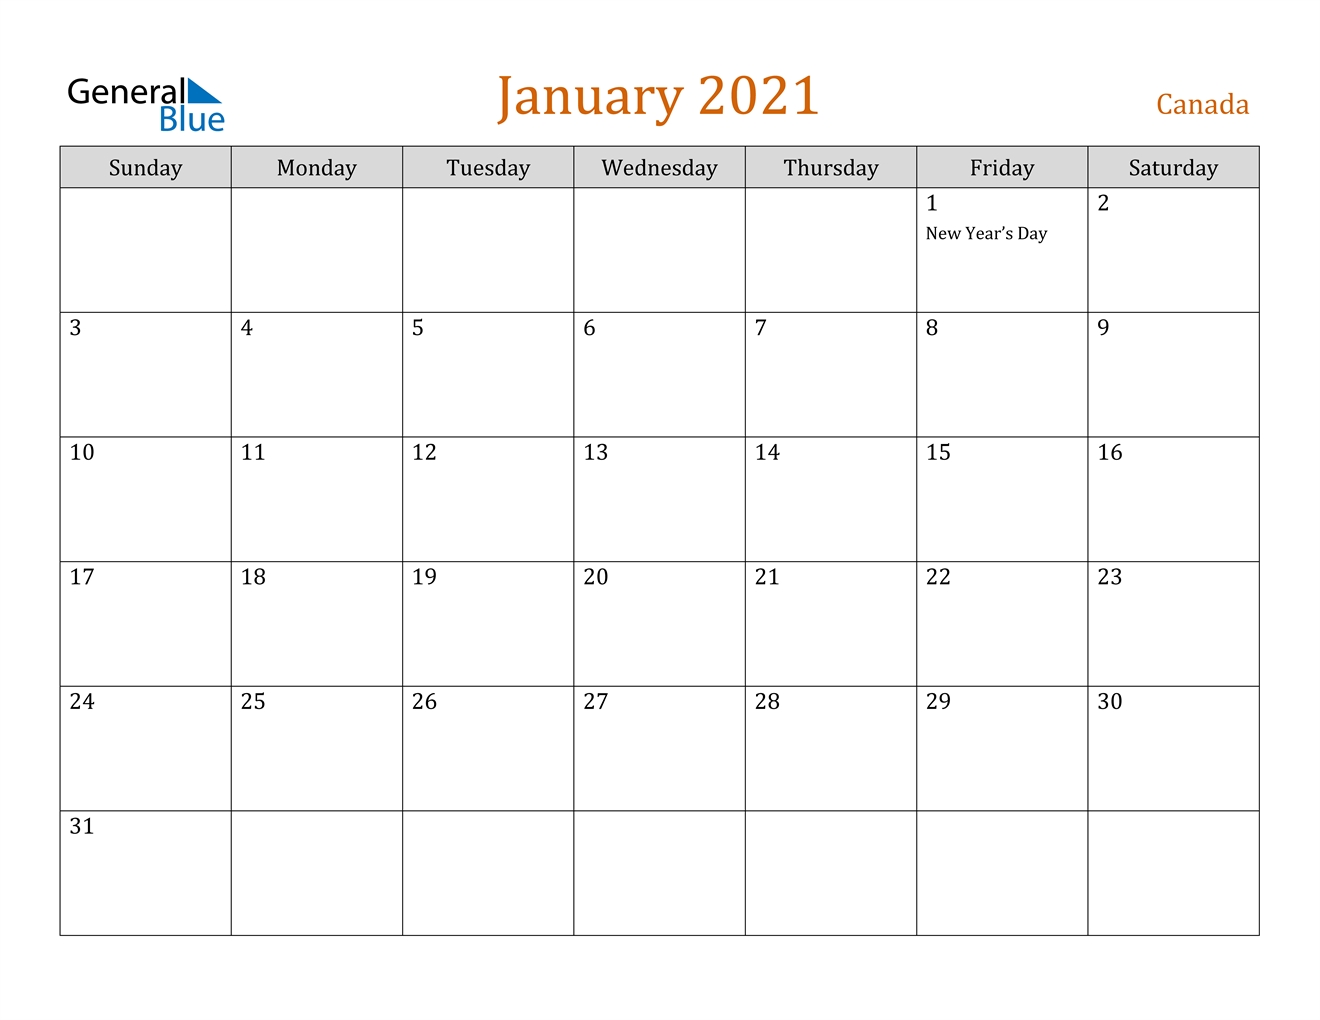 Canada January 2021 Calendar With Holidays